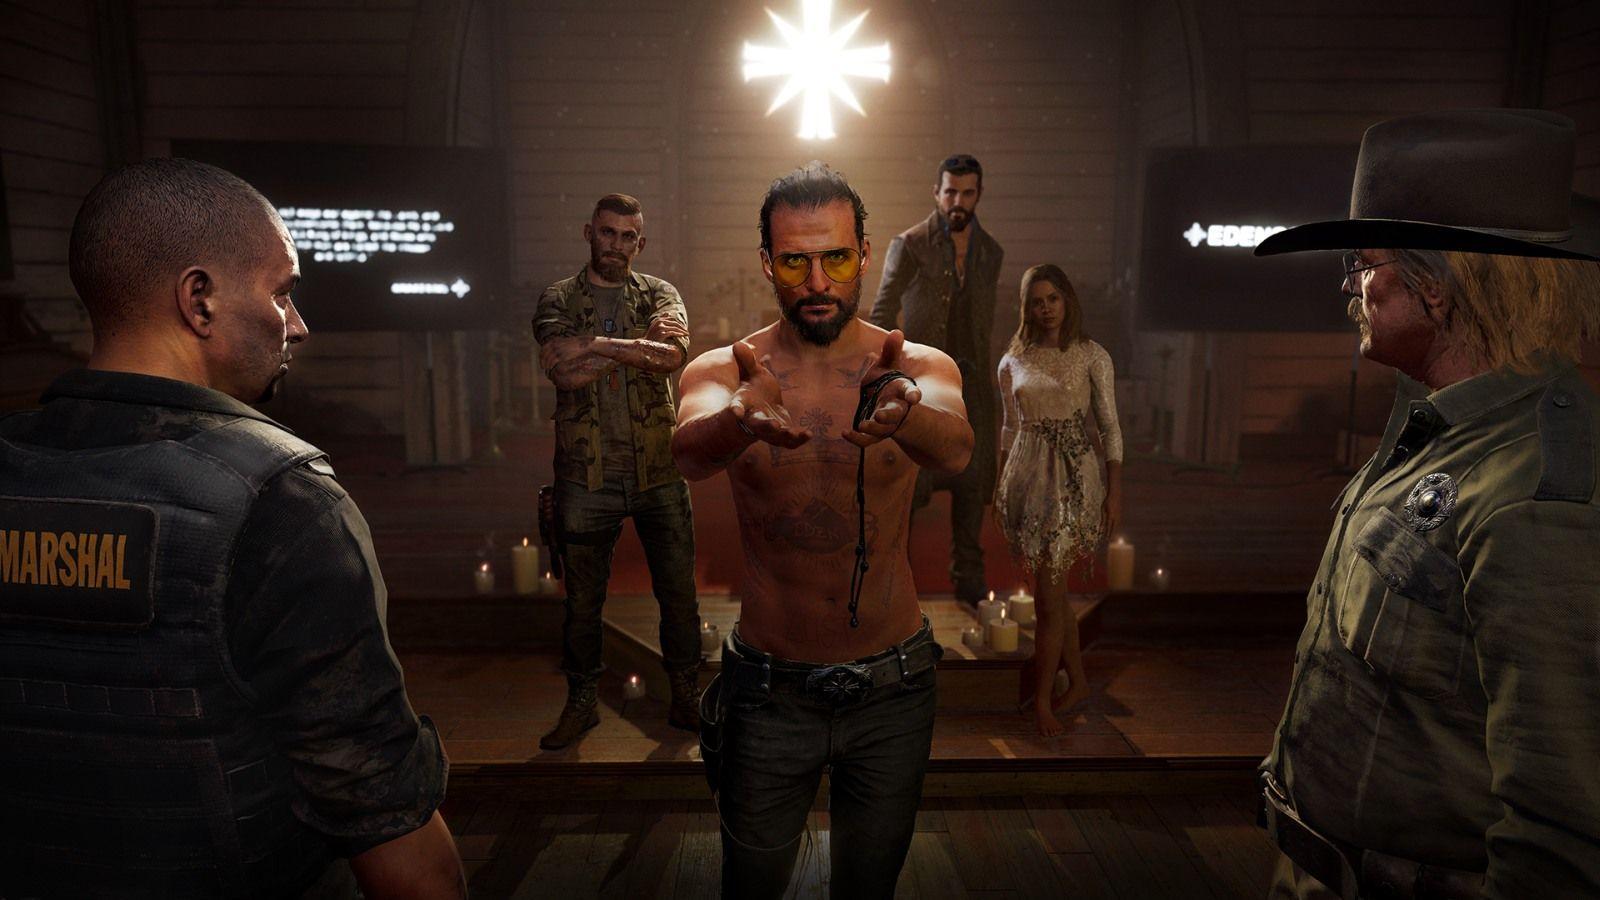 Farcry 5 Far Cry 5 Far Cry Game Far Cry 5 Ps4